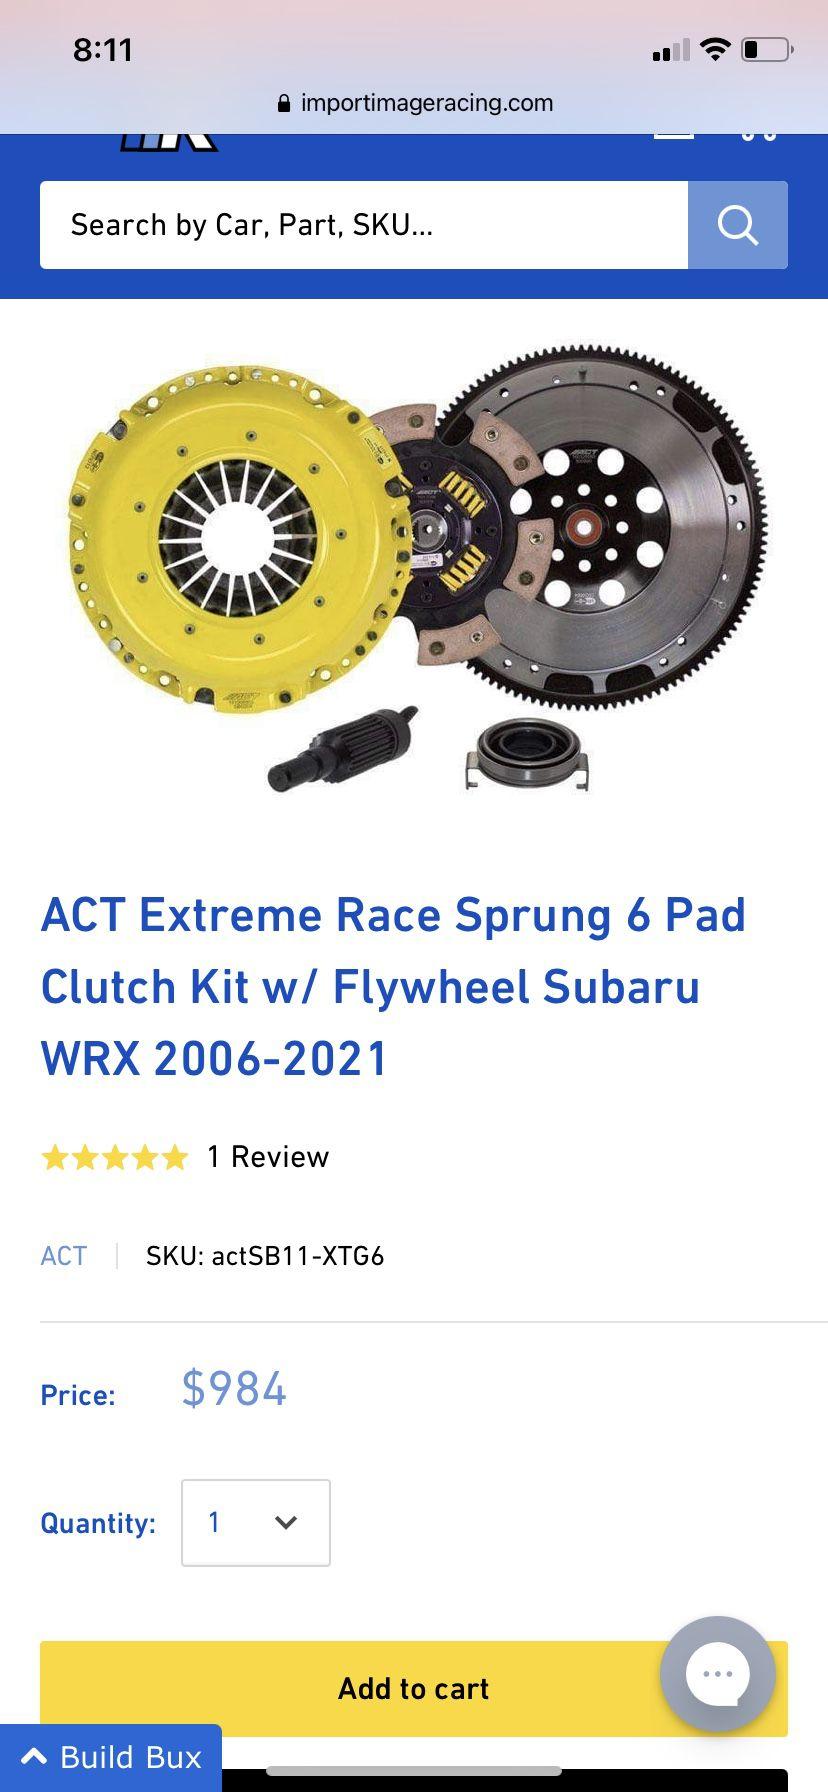 ACT clutch kit for 2015-2021 Subaru WRX